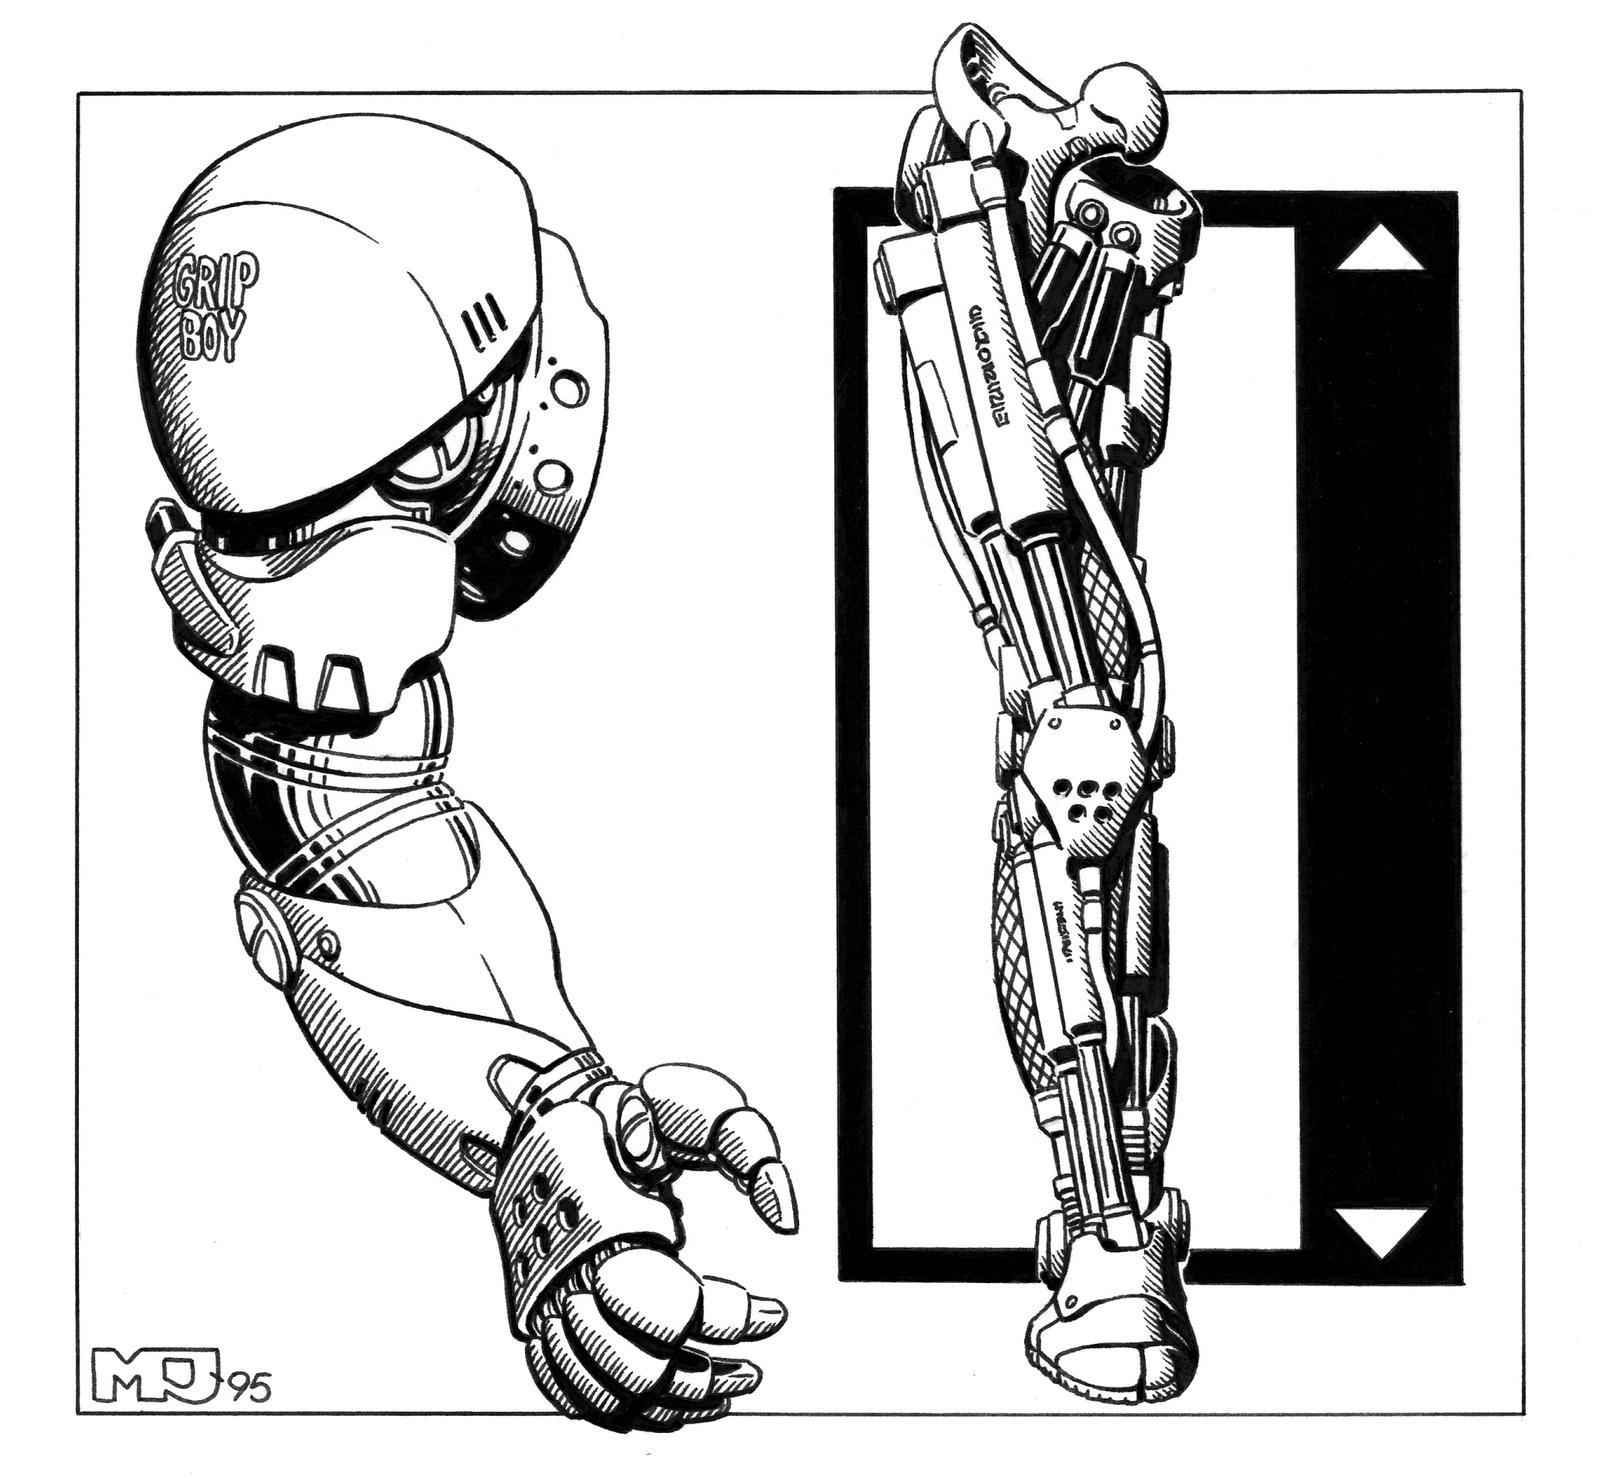 Shadowrun - GripBoy by SteamPoweredMikeJ